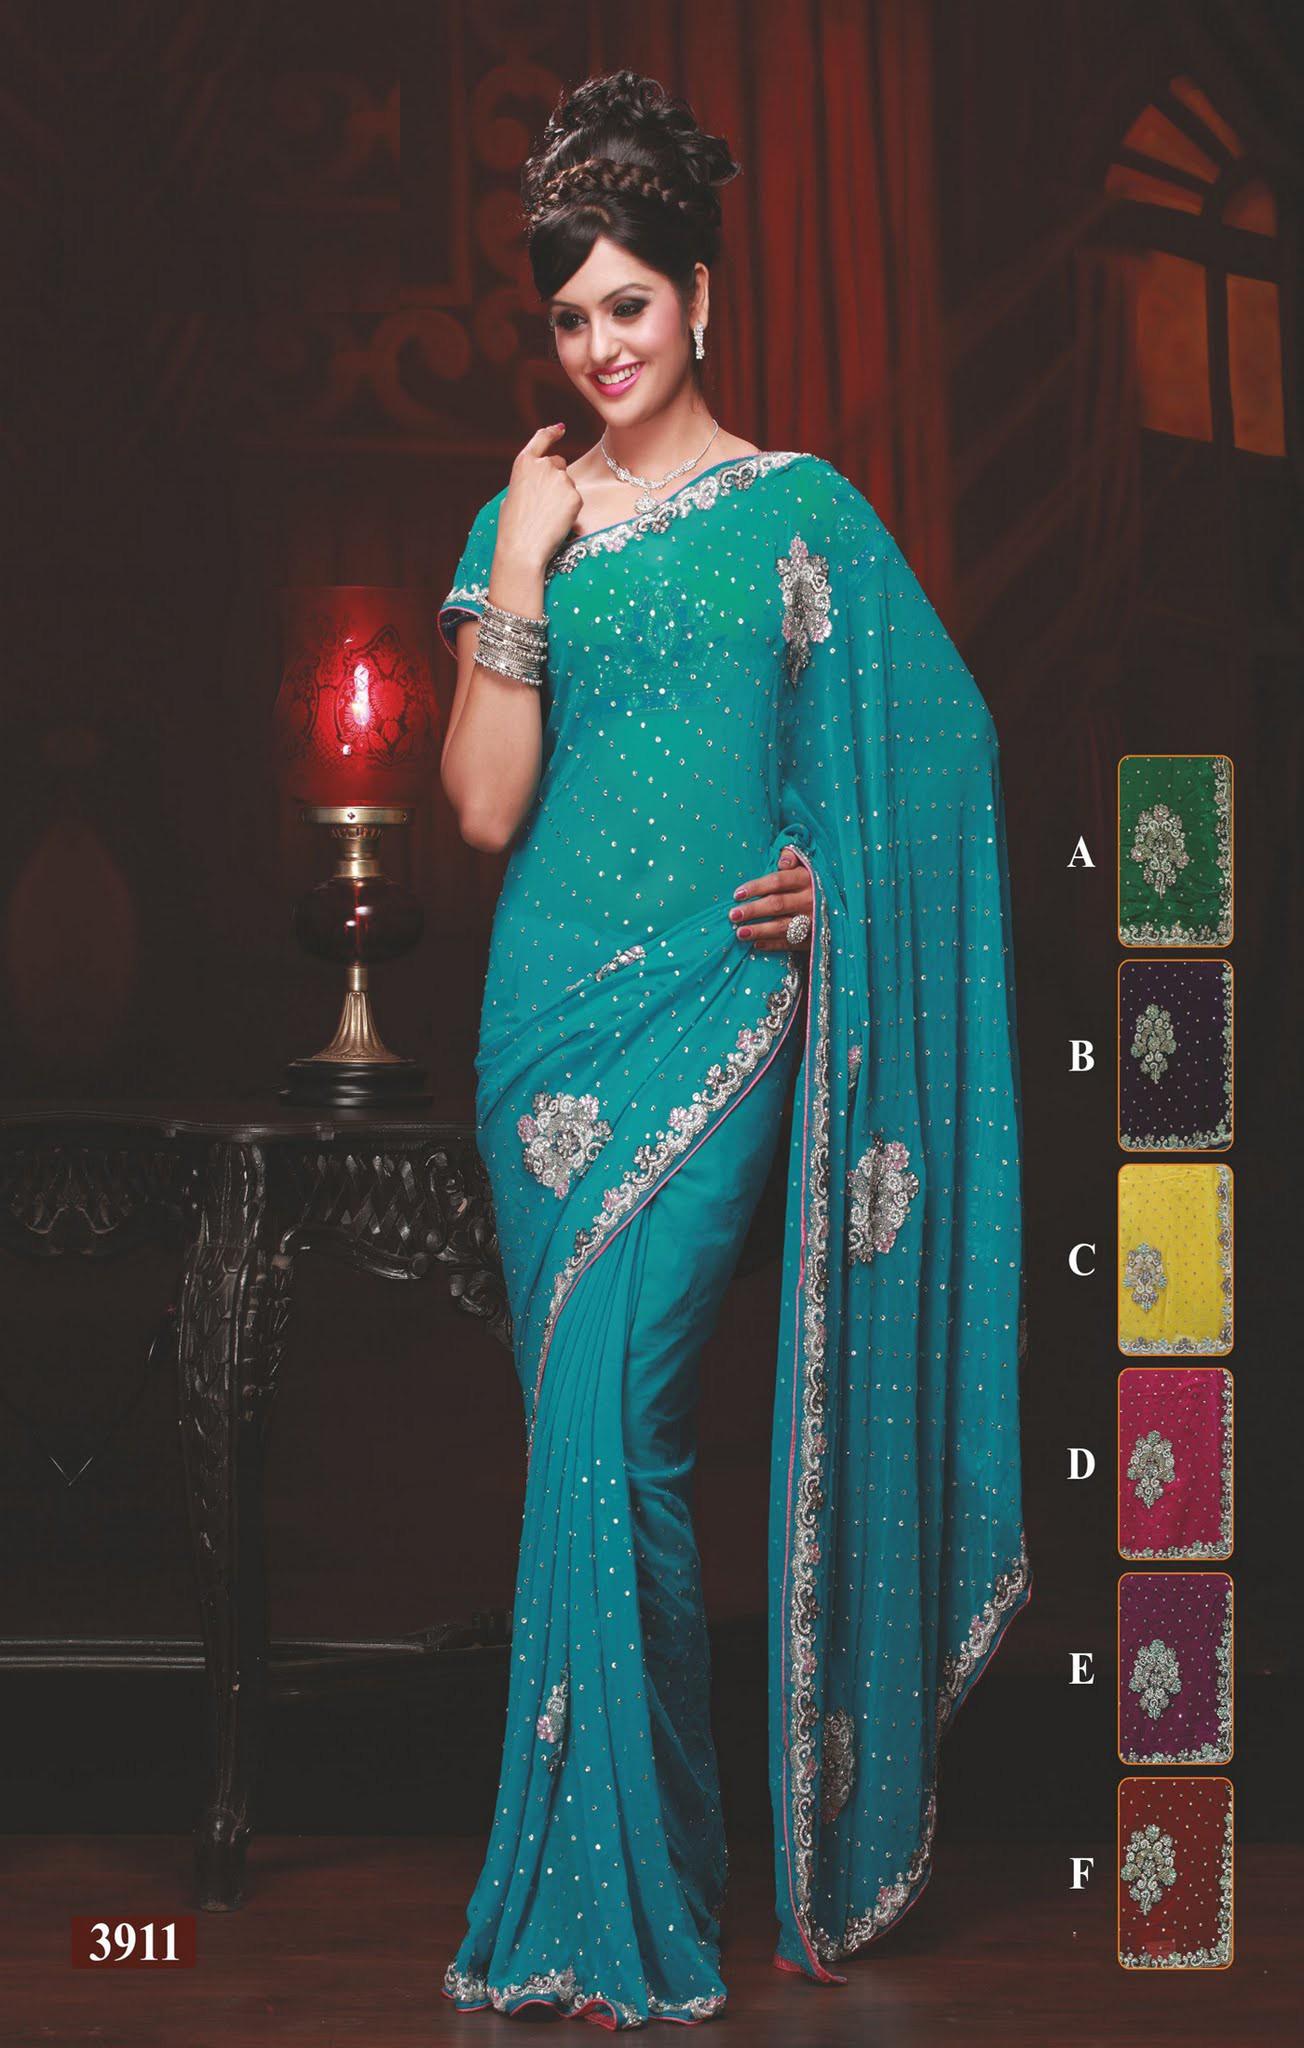 Mariage indien robe for Robes de mariage indien en ligne